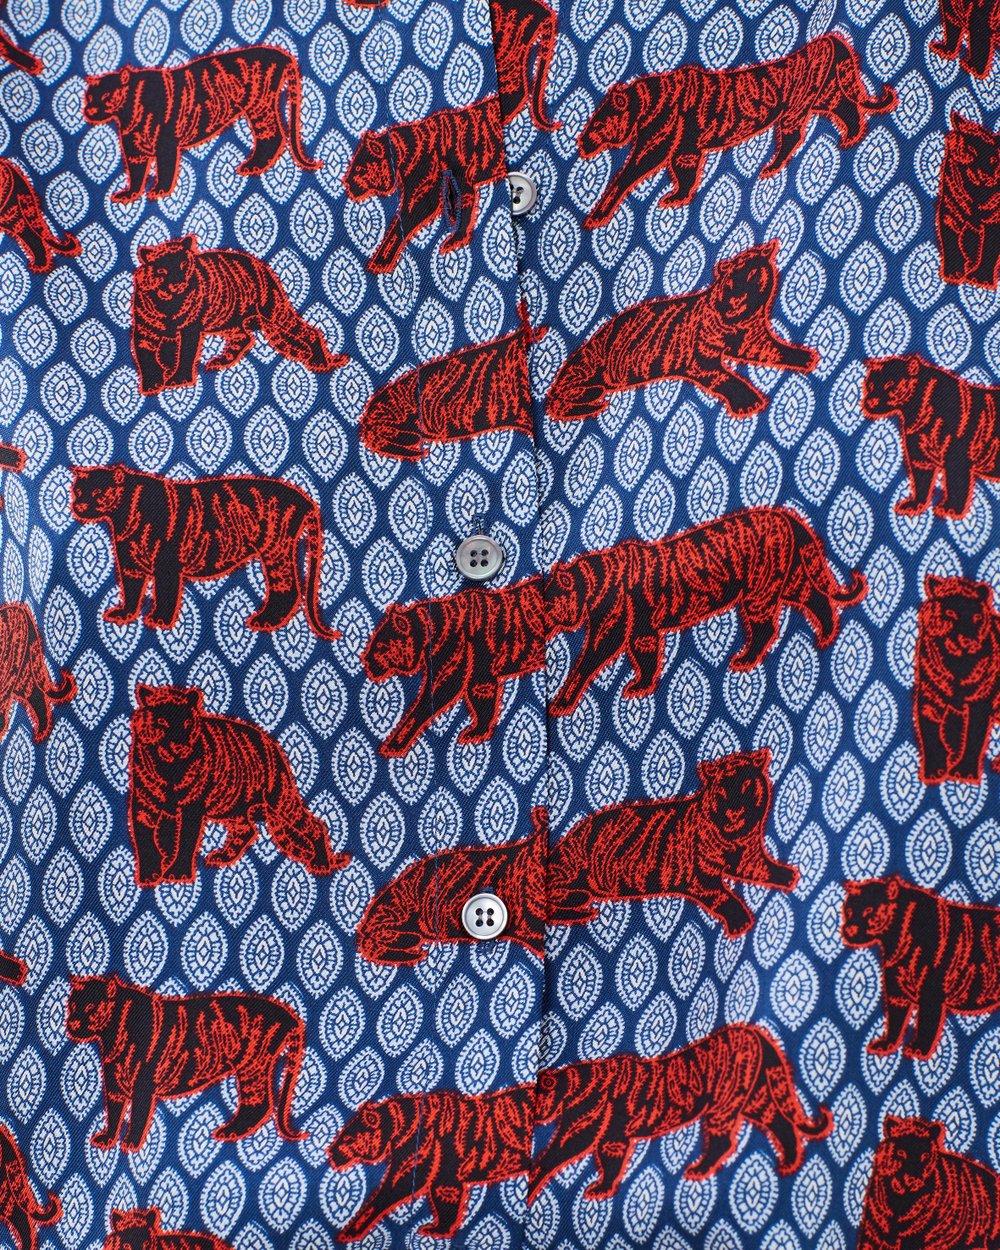 d69ab937b1890 Lentil Silk Twill Tiger Foulard Top by J.Crew Online